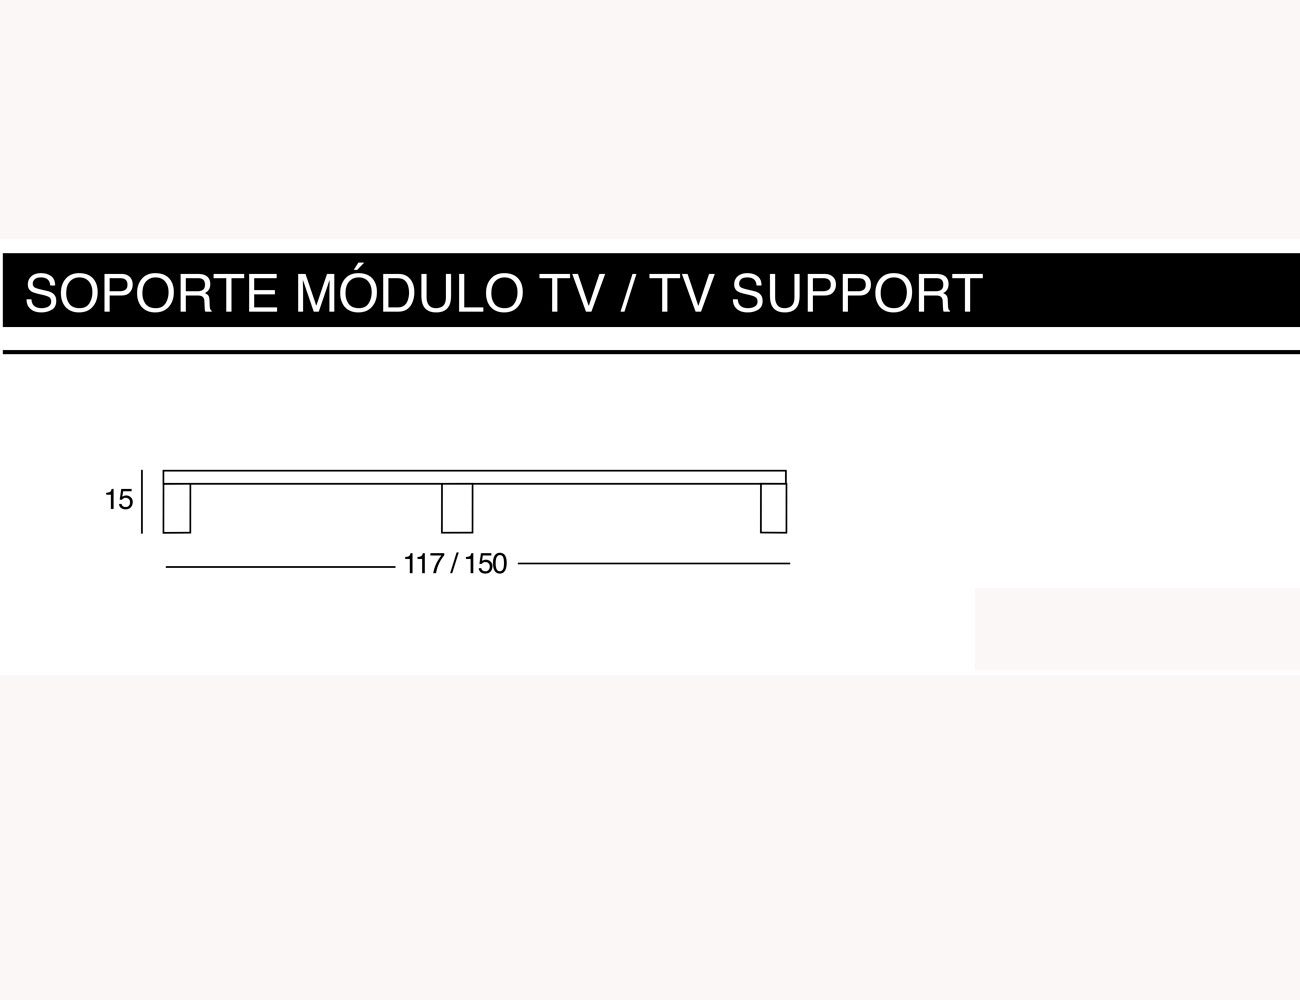 Soporte modulo tv